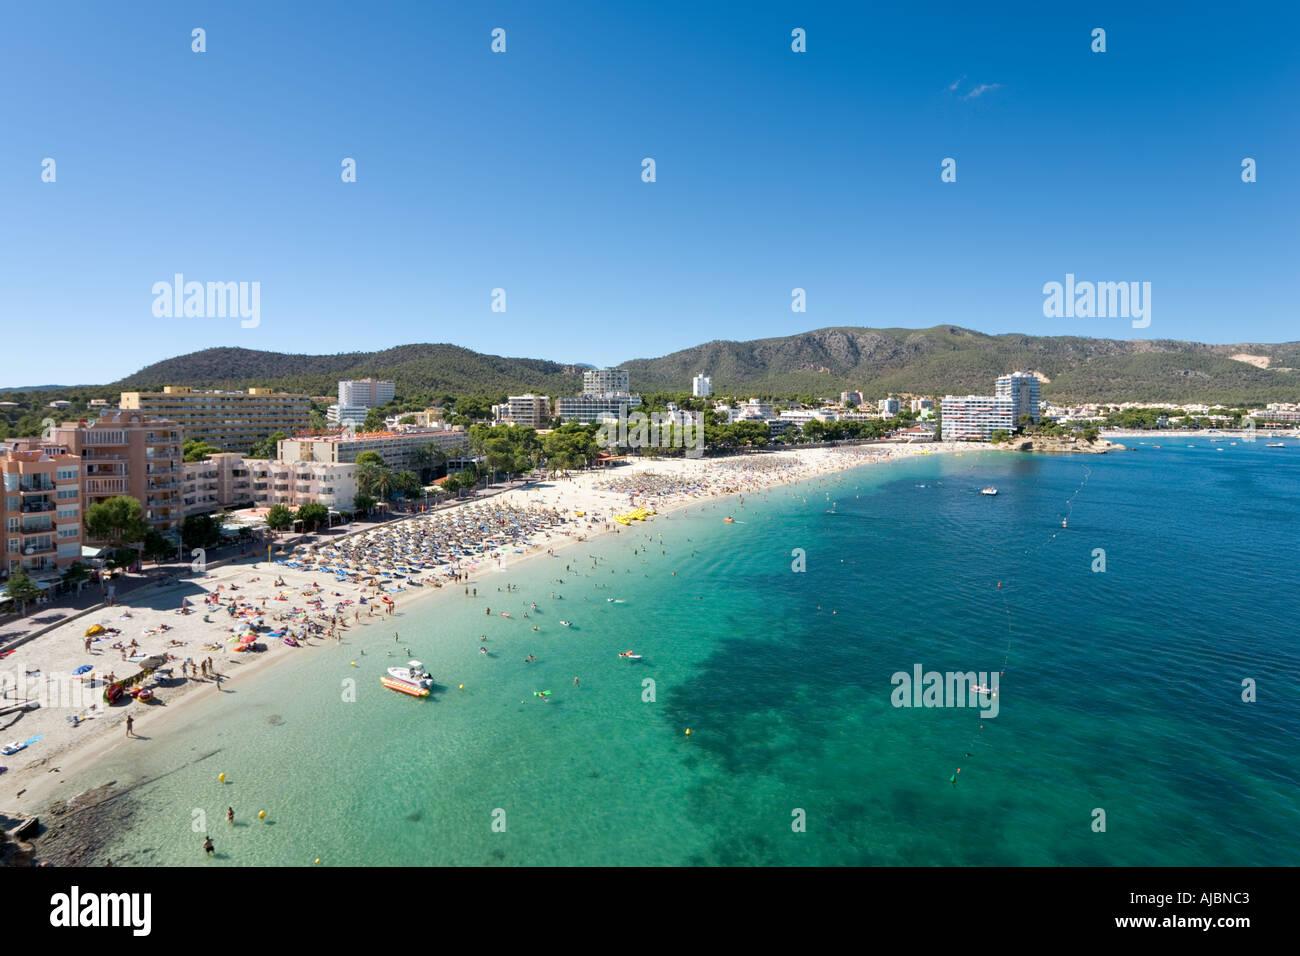 https www alamy es playa palma nova la bahia de palma mallorca islas baleares espana image4794818 html